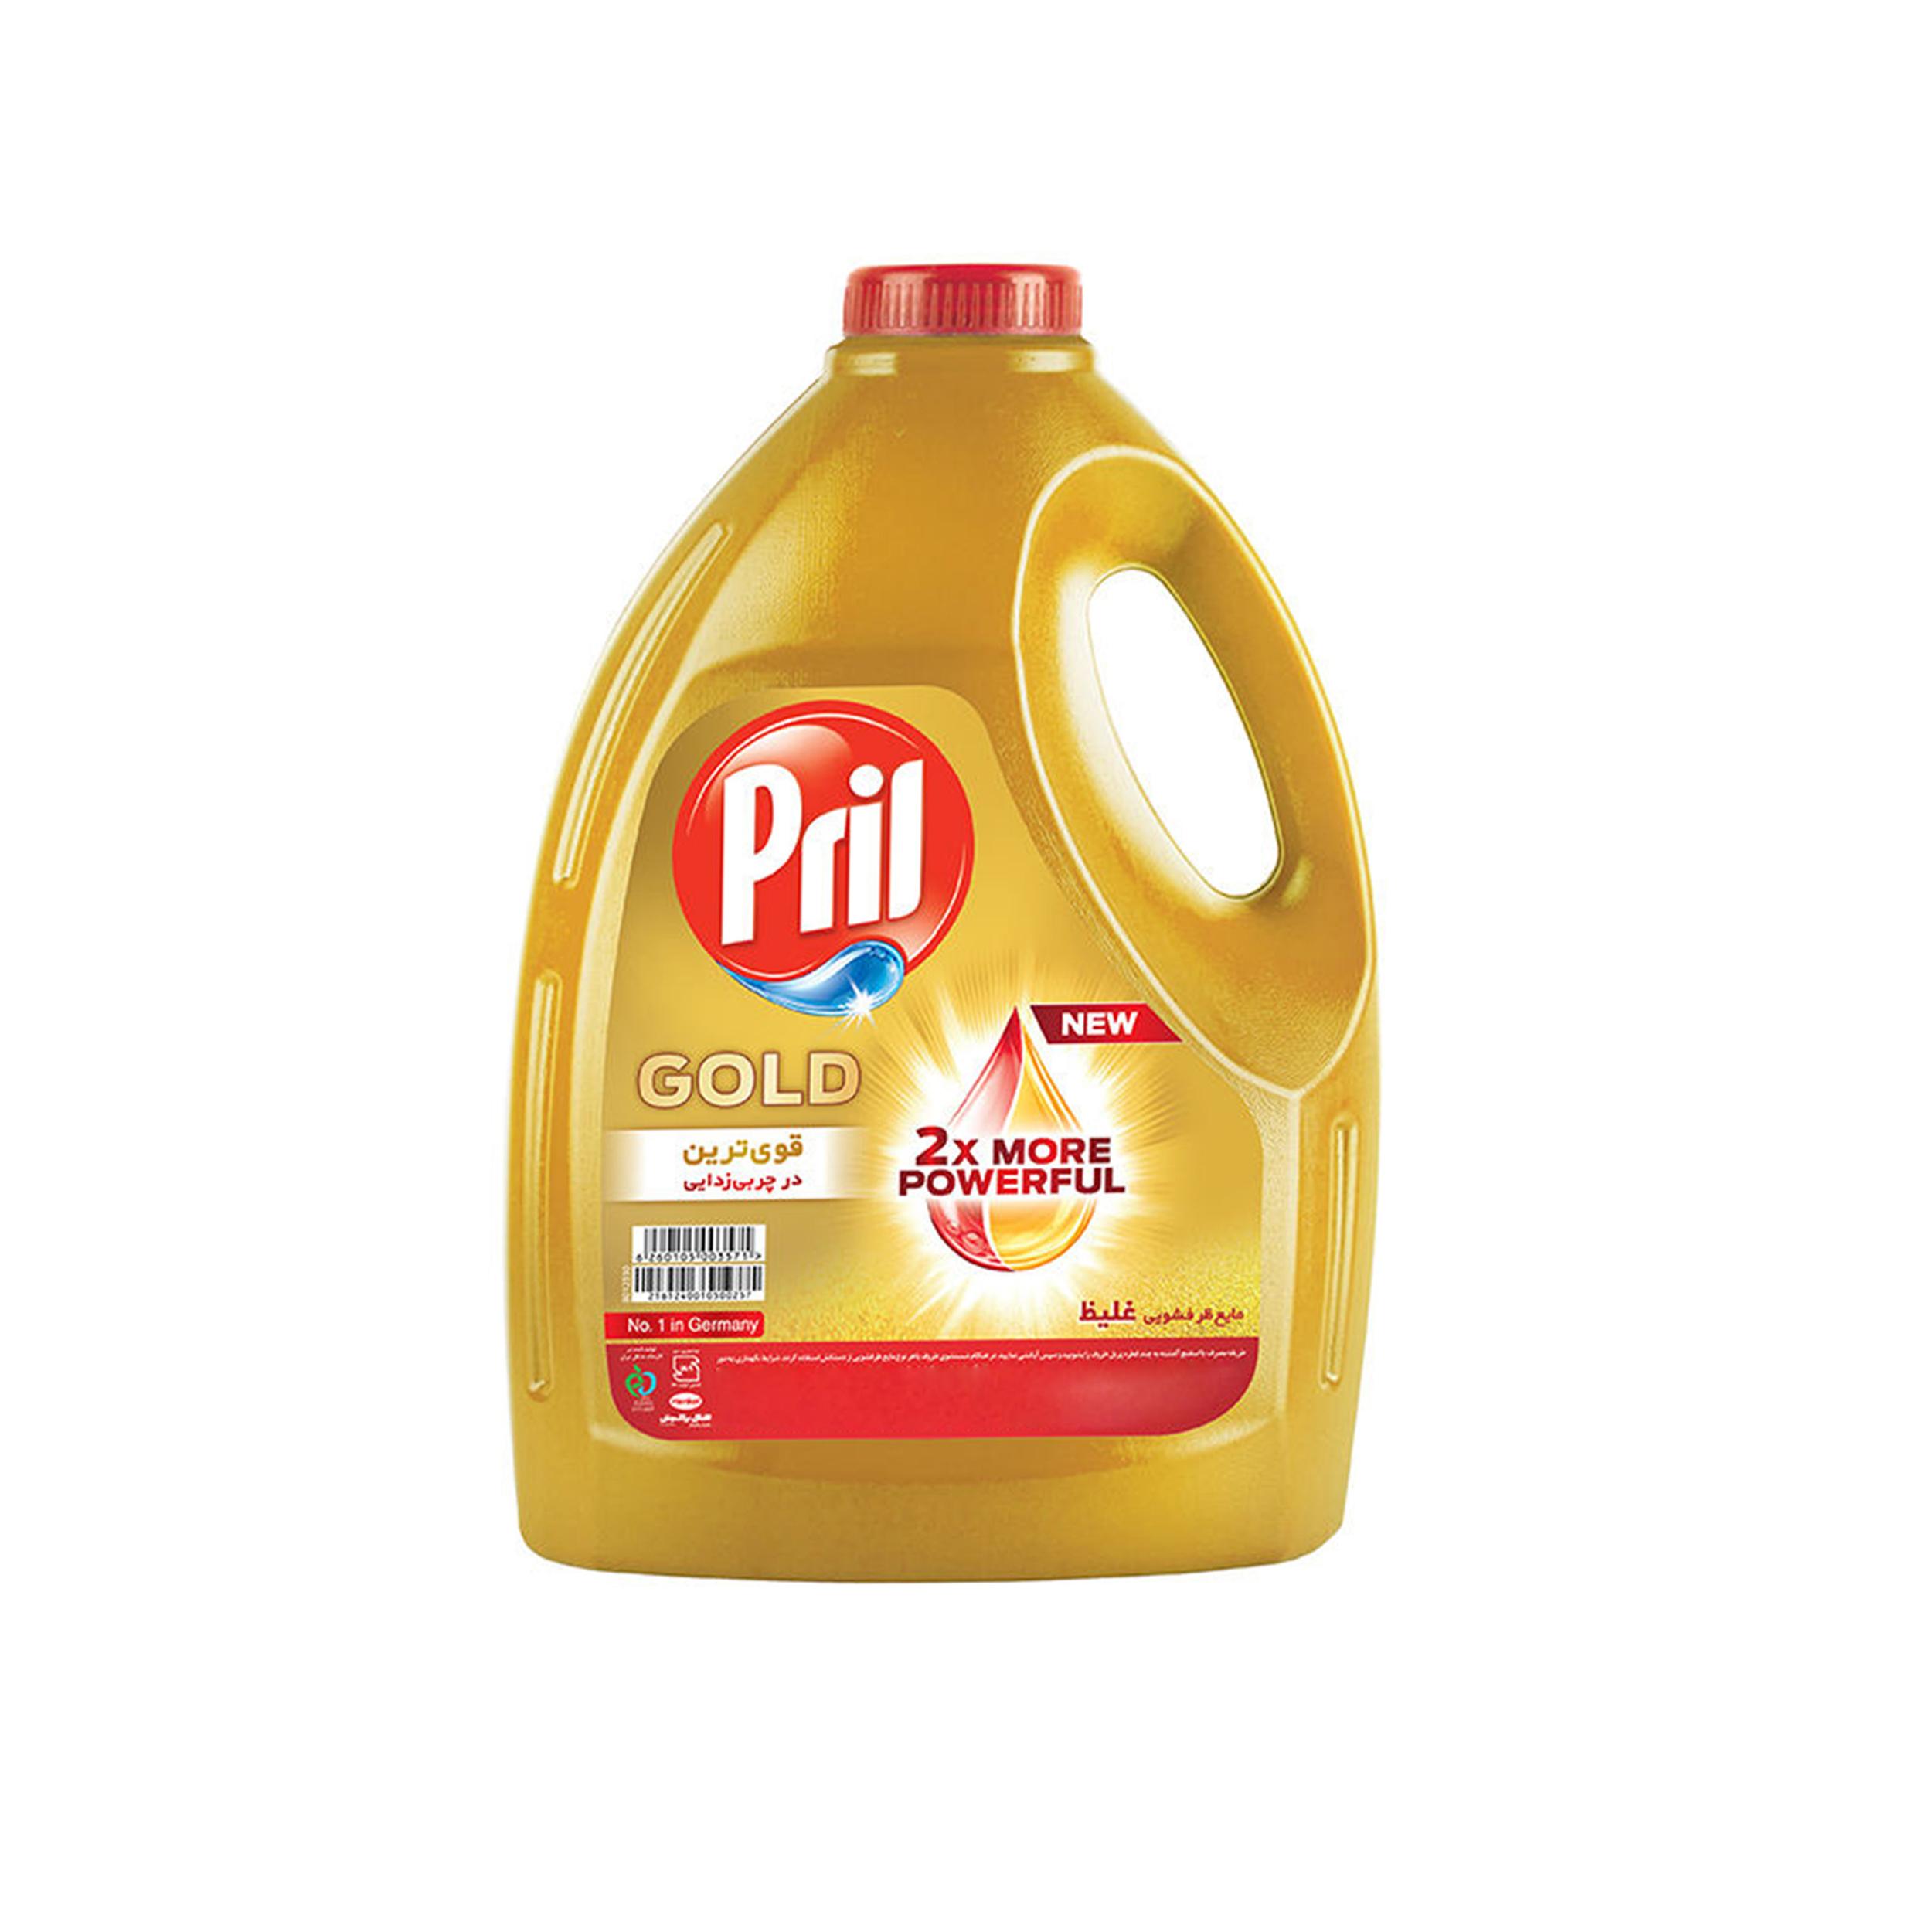 مایع ظرفشویی پریل گلد مقدار 3.75 کیلوگرم main 1 1